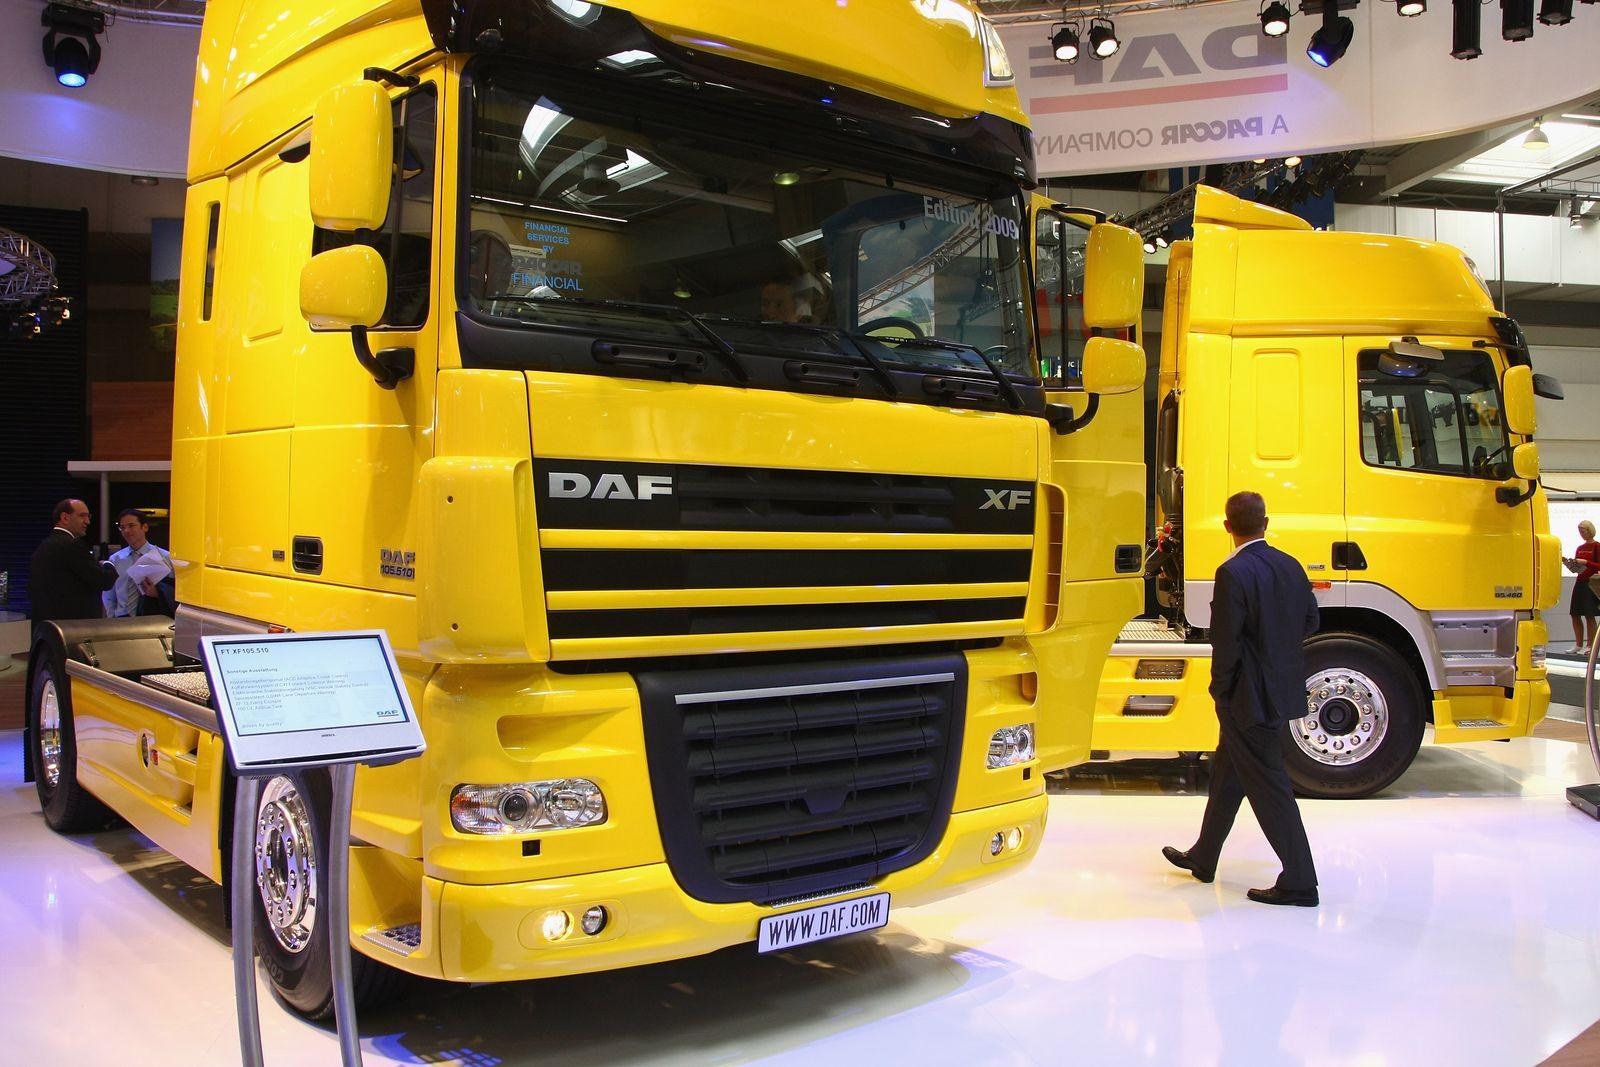 LKW / Truck / DAF / Paccar (?)